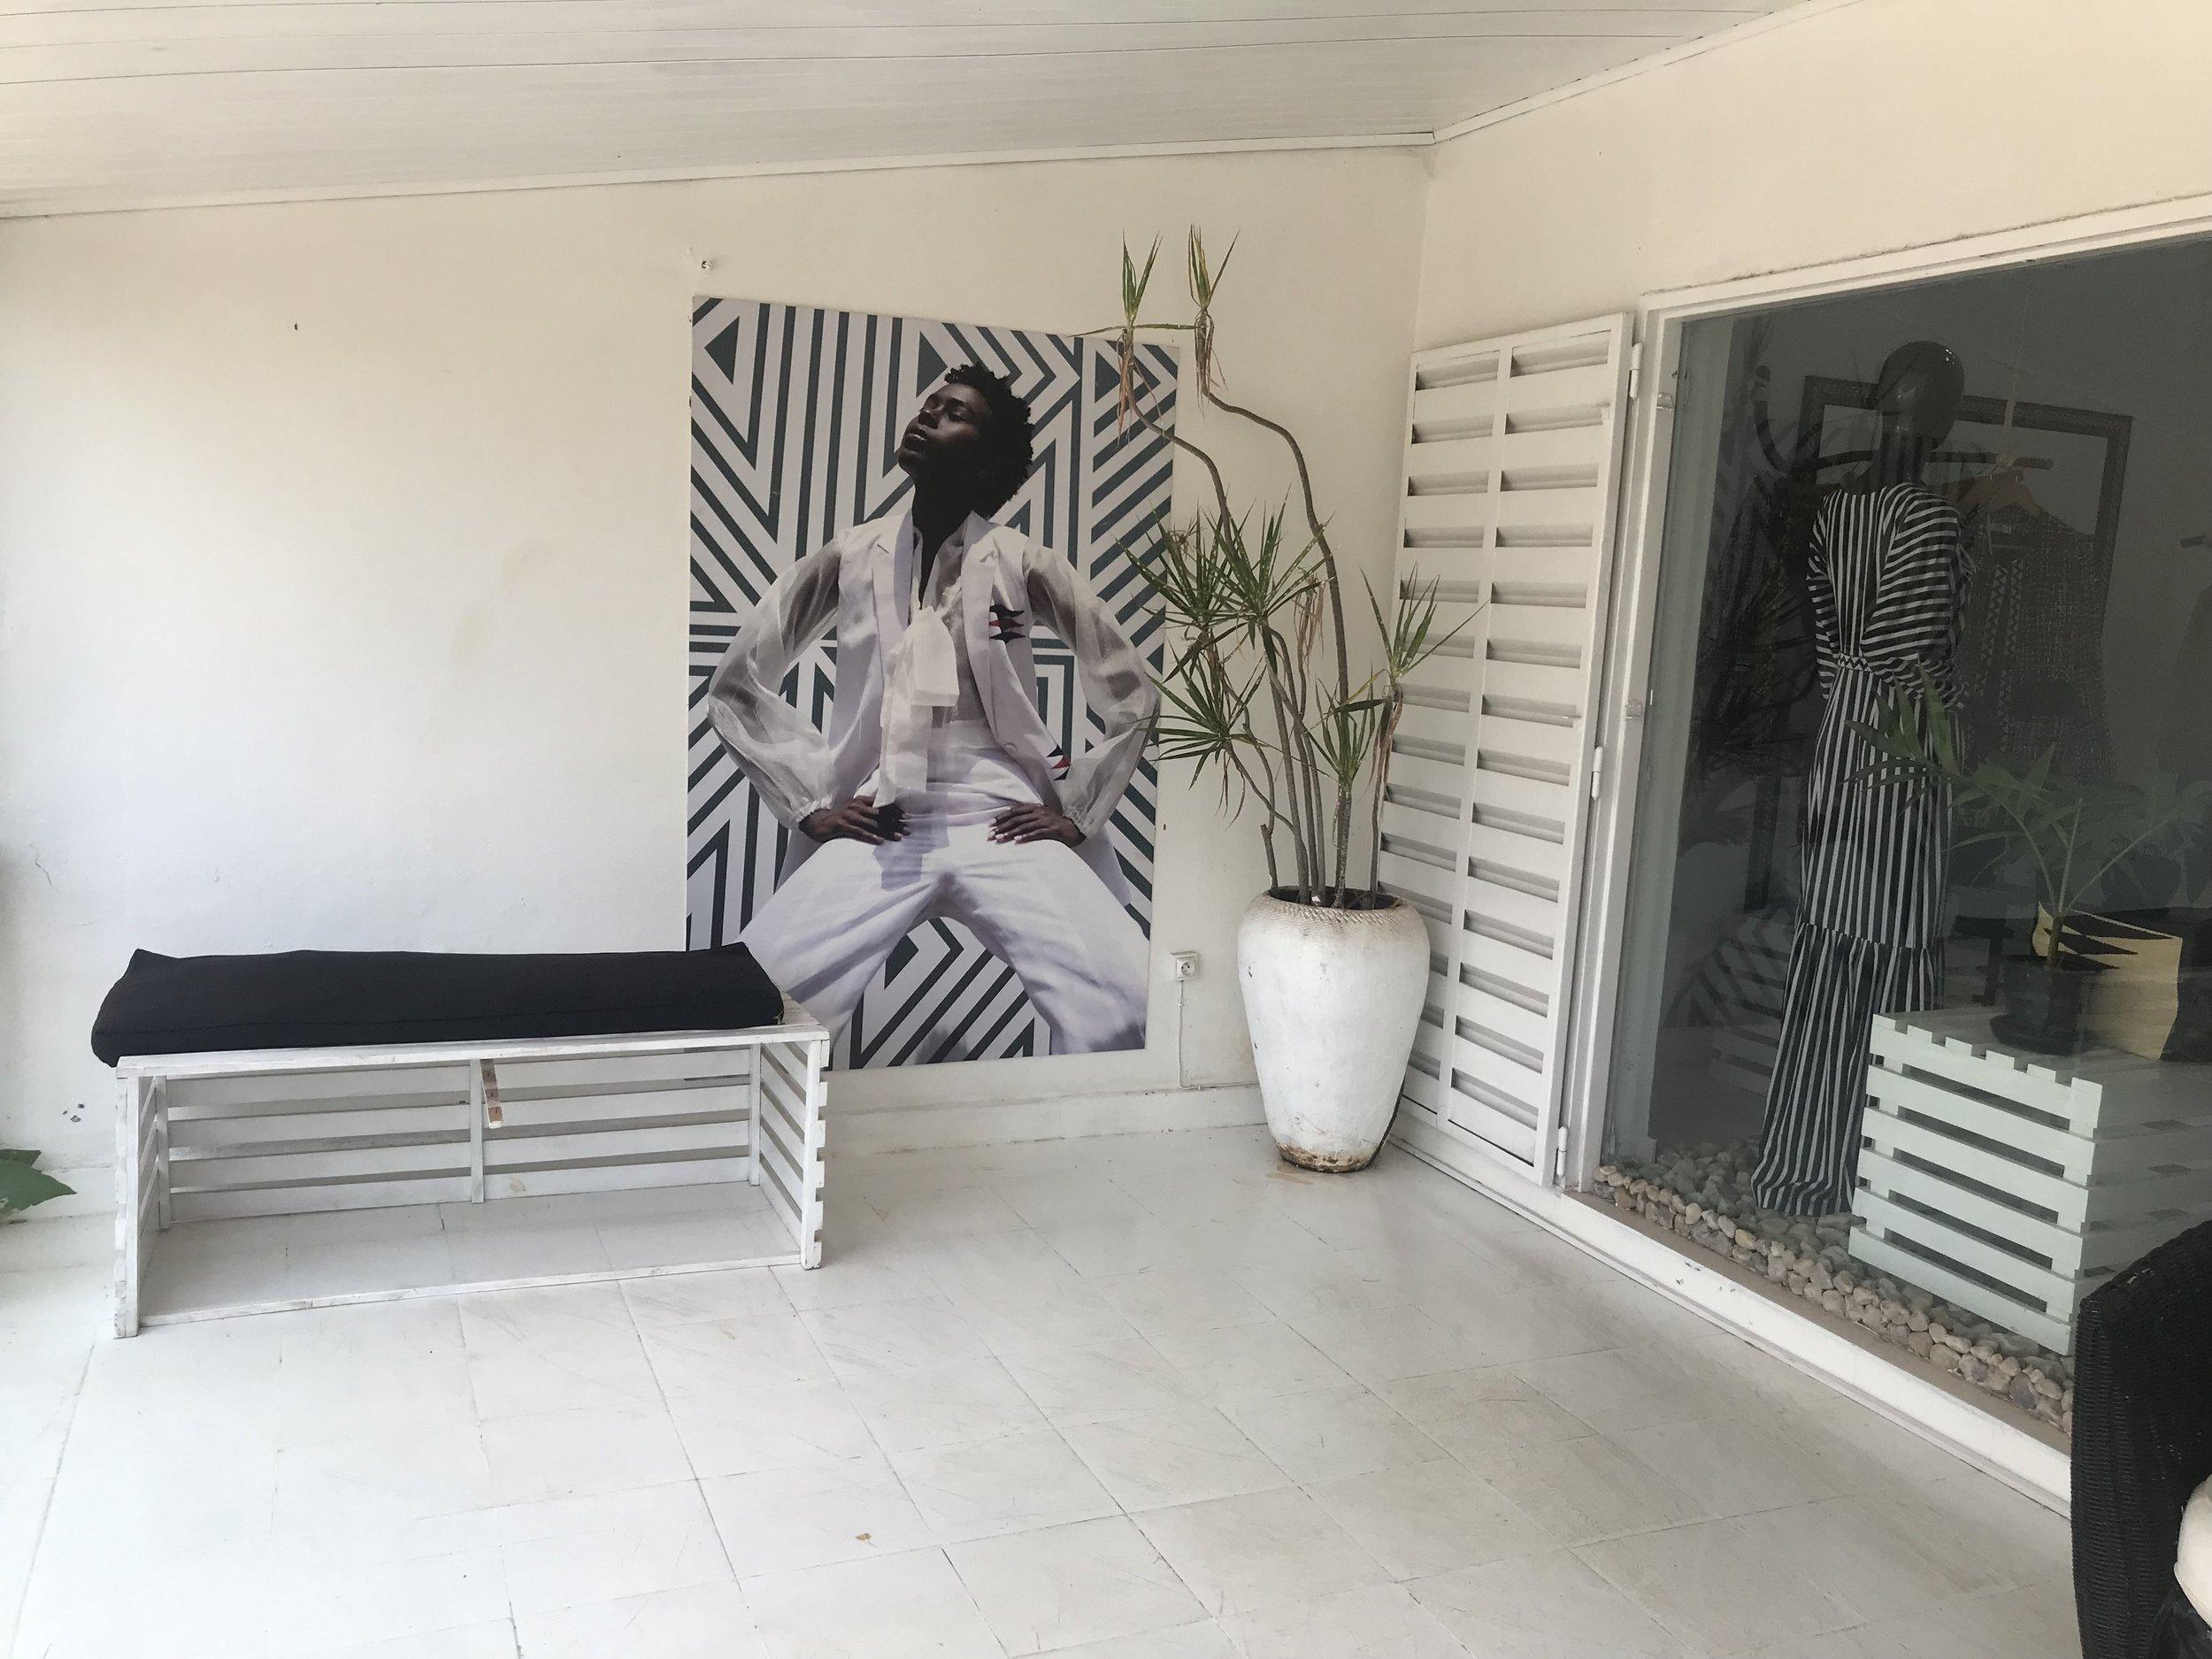 IMG_6070 2VickieRemoe-travel-kigali-rwanda-review-kwibohora25-hotels-africa.JPG